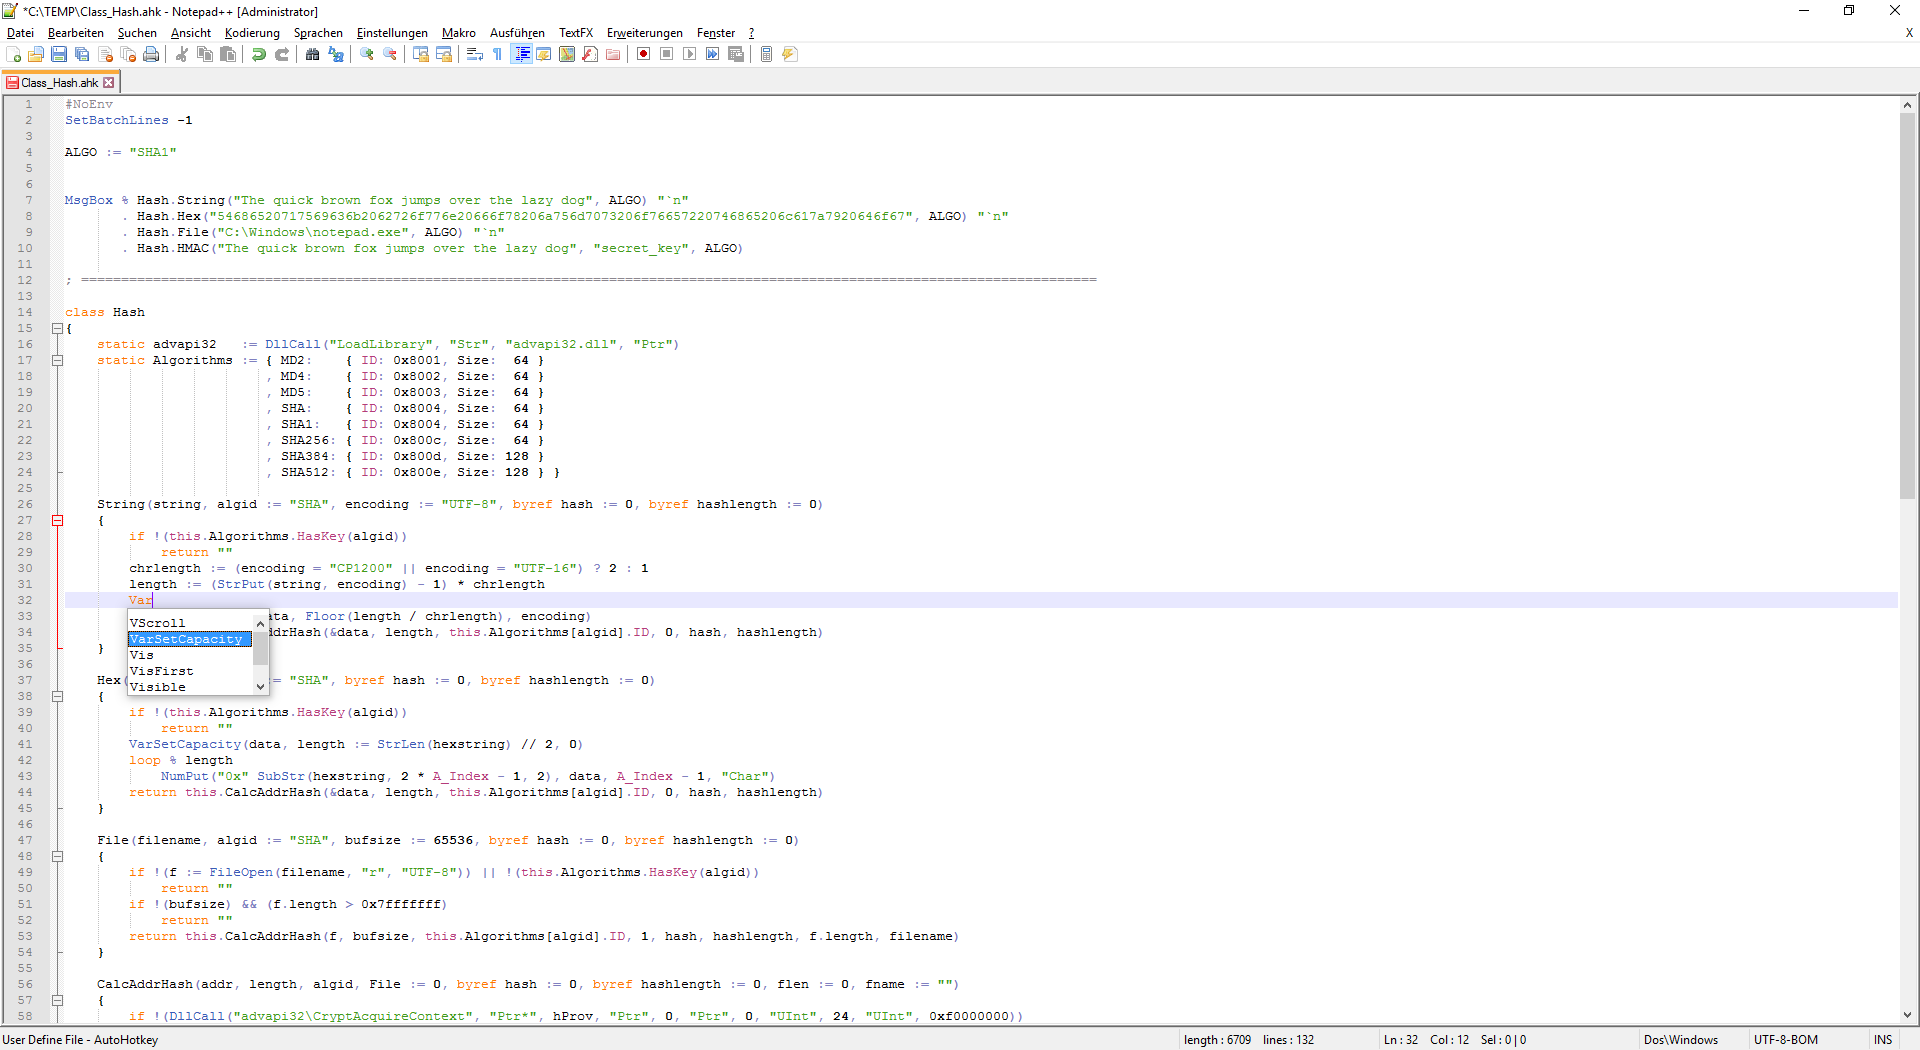 GitHub - jNizM/ahk_notepad-plus-plus: Setup Notepad++ for